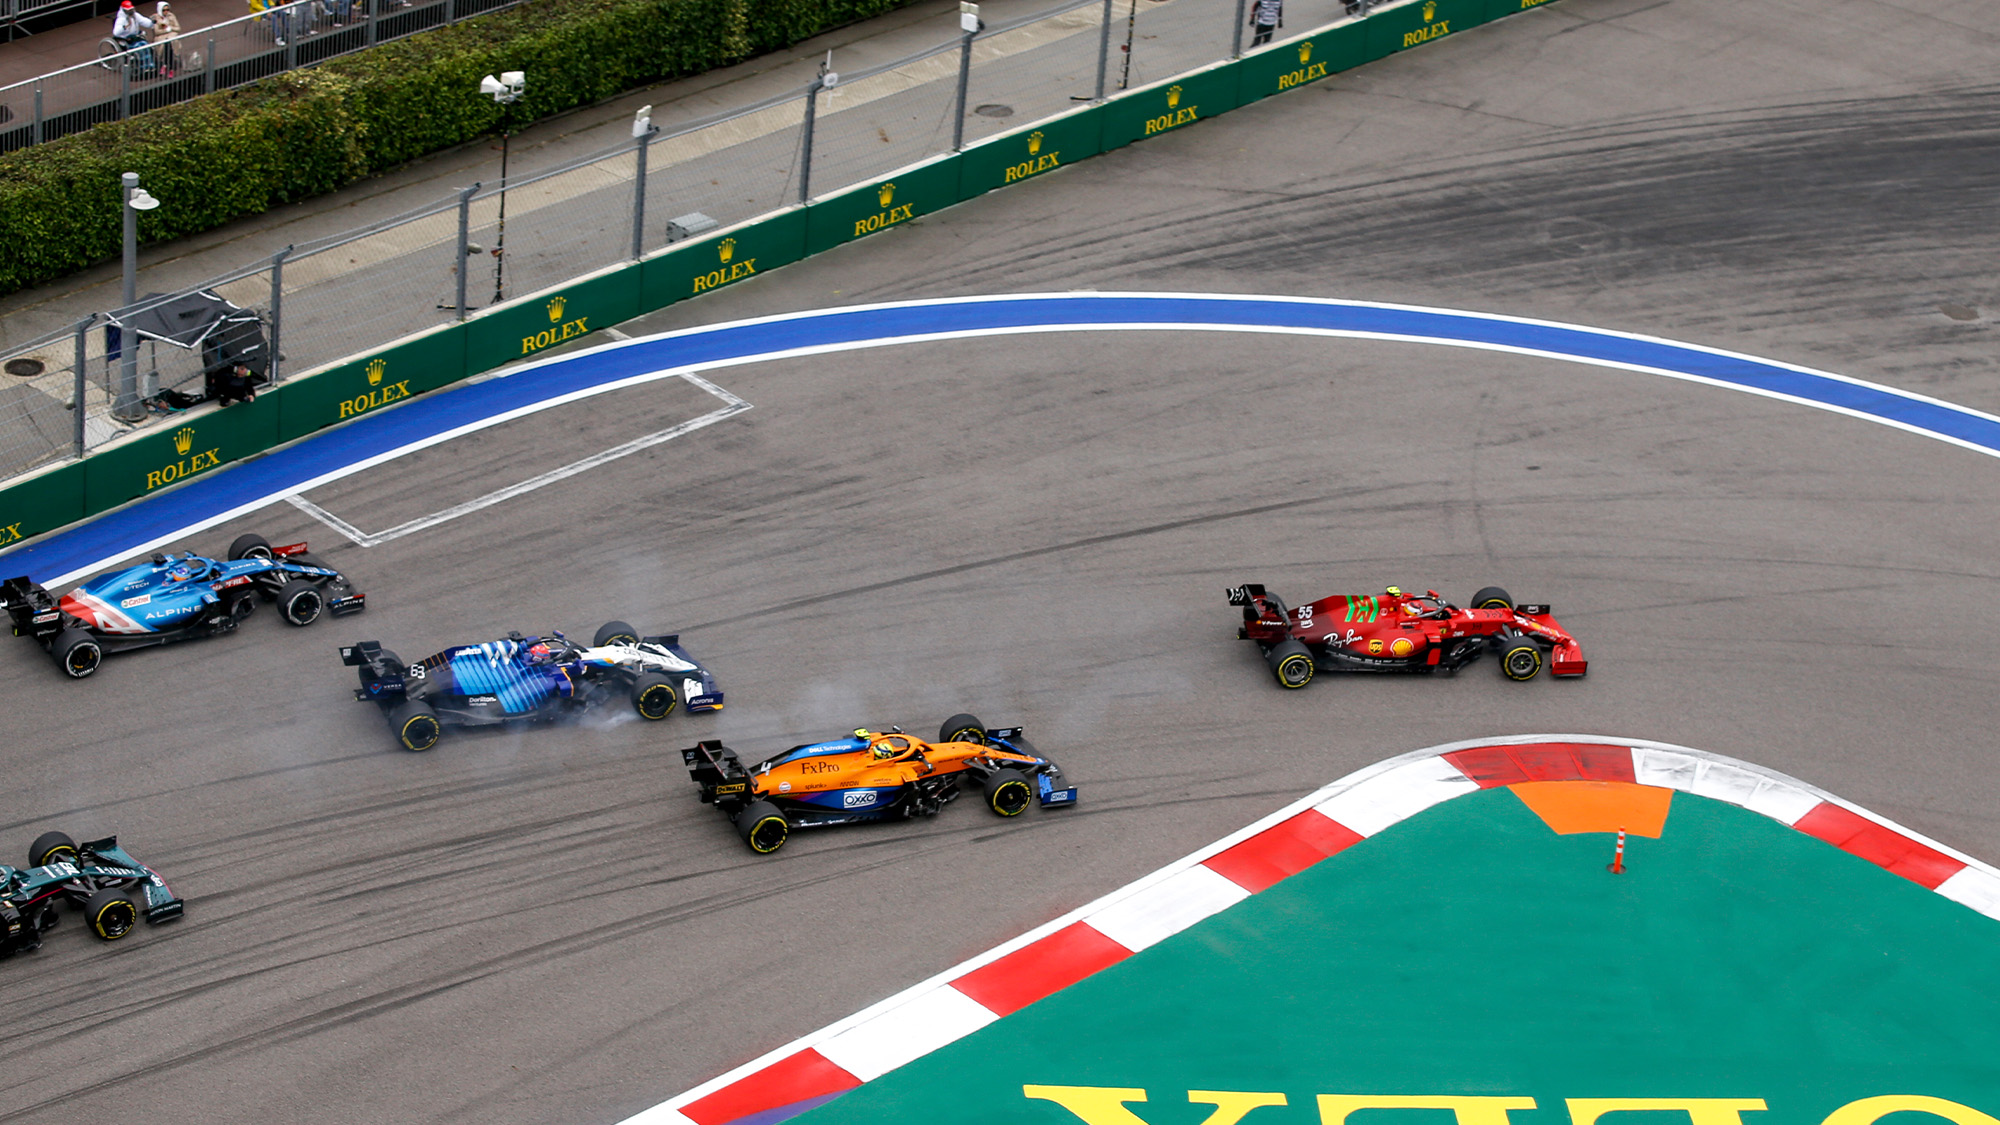 Carlos Sainz leads at the satrt of 2021 Russian Grand Prix